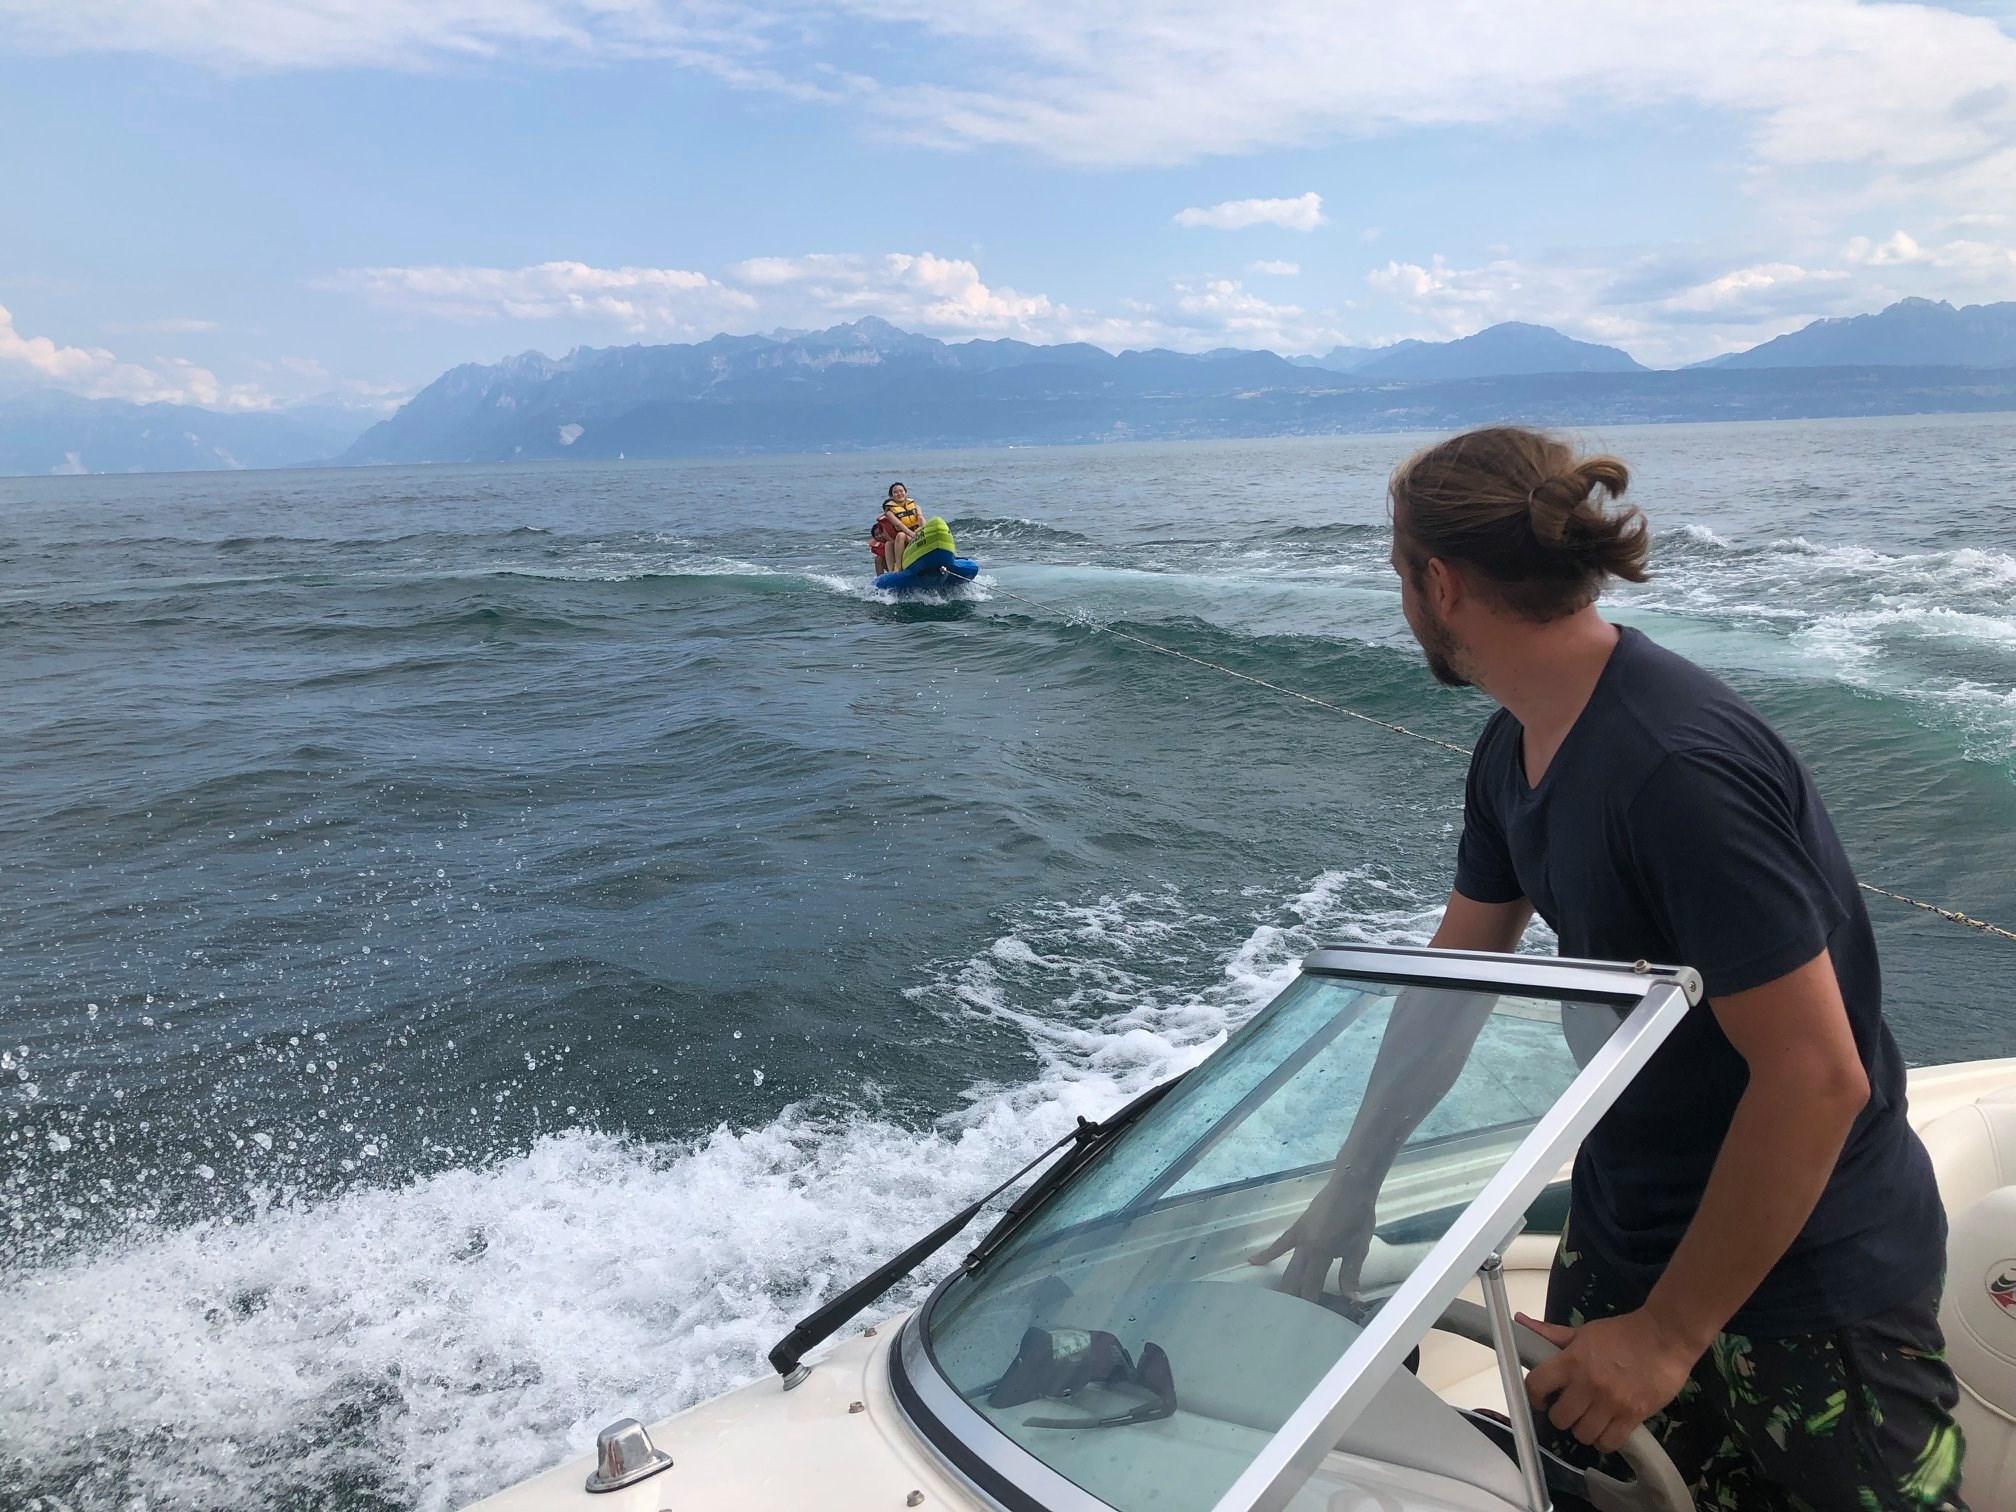 BM Summer Course lake activities